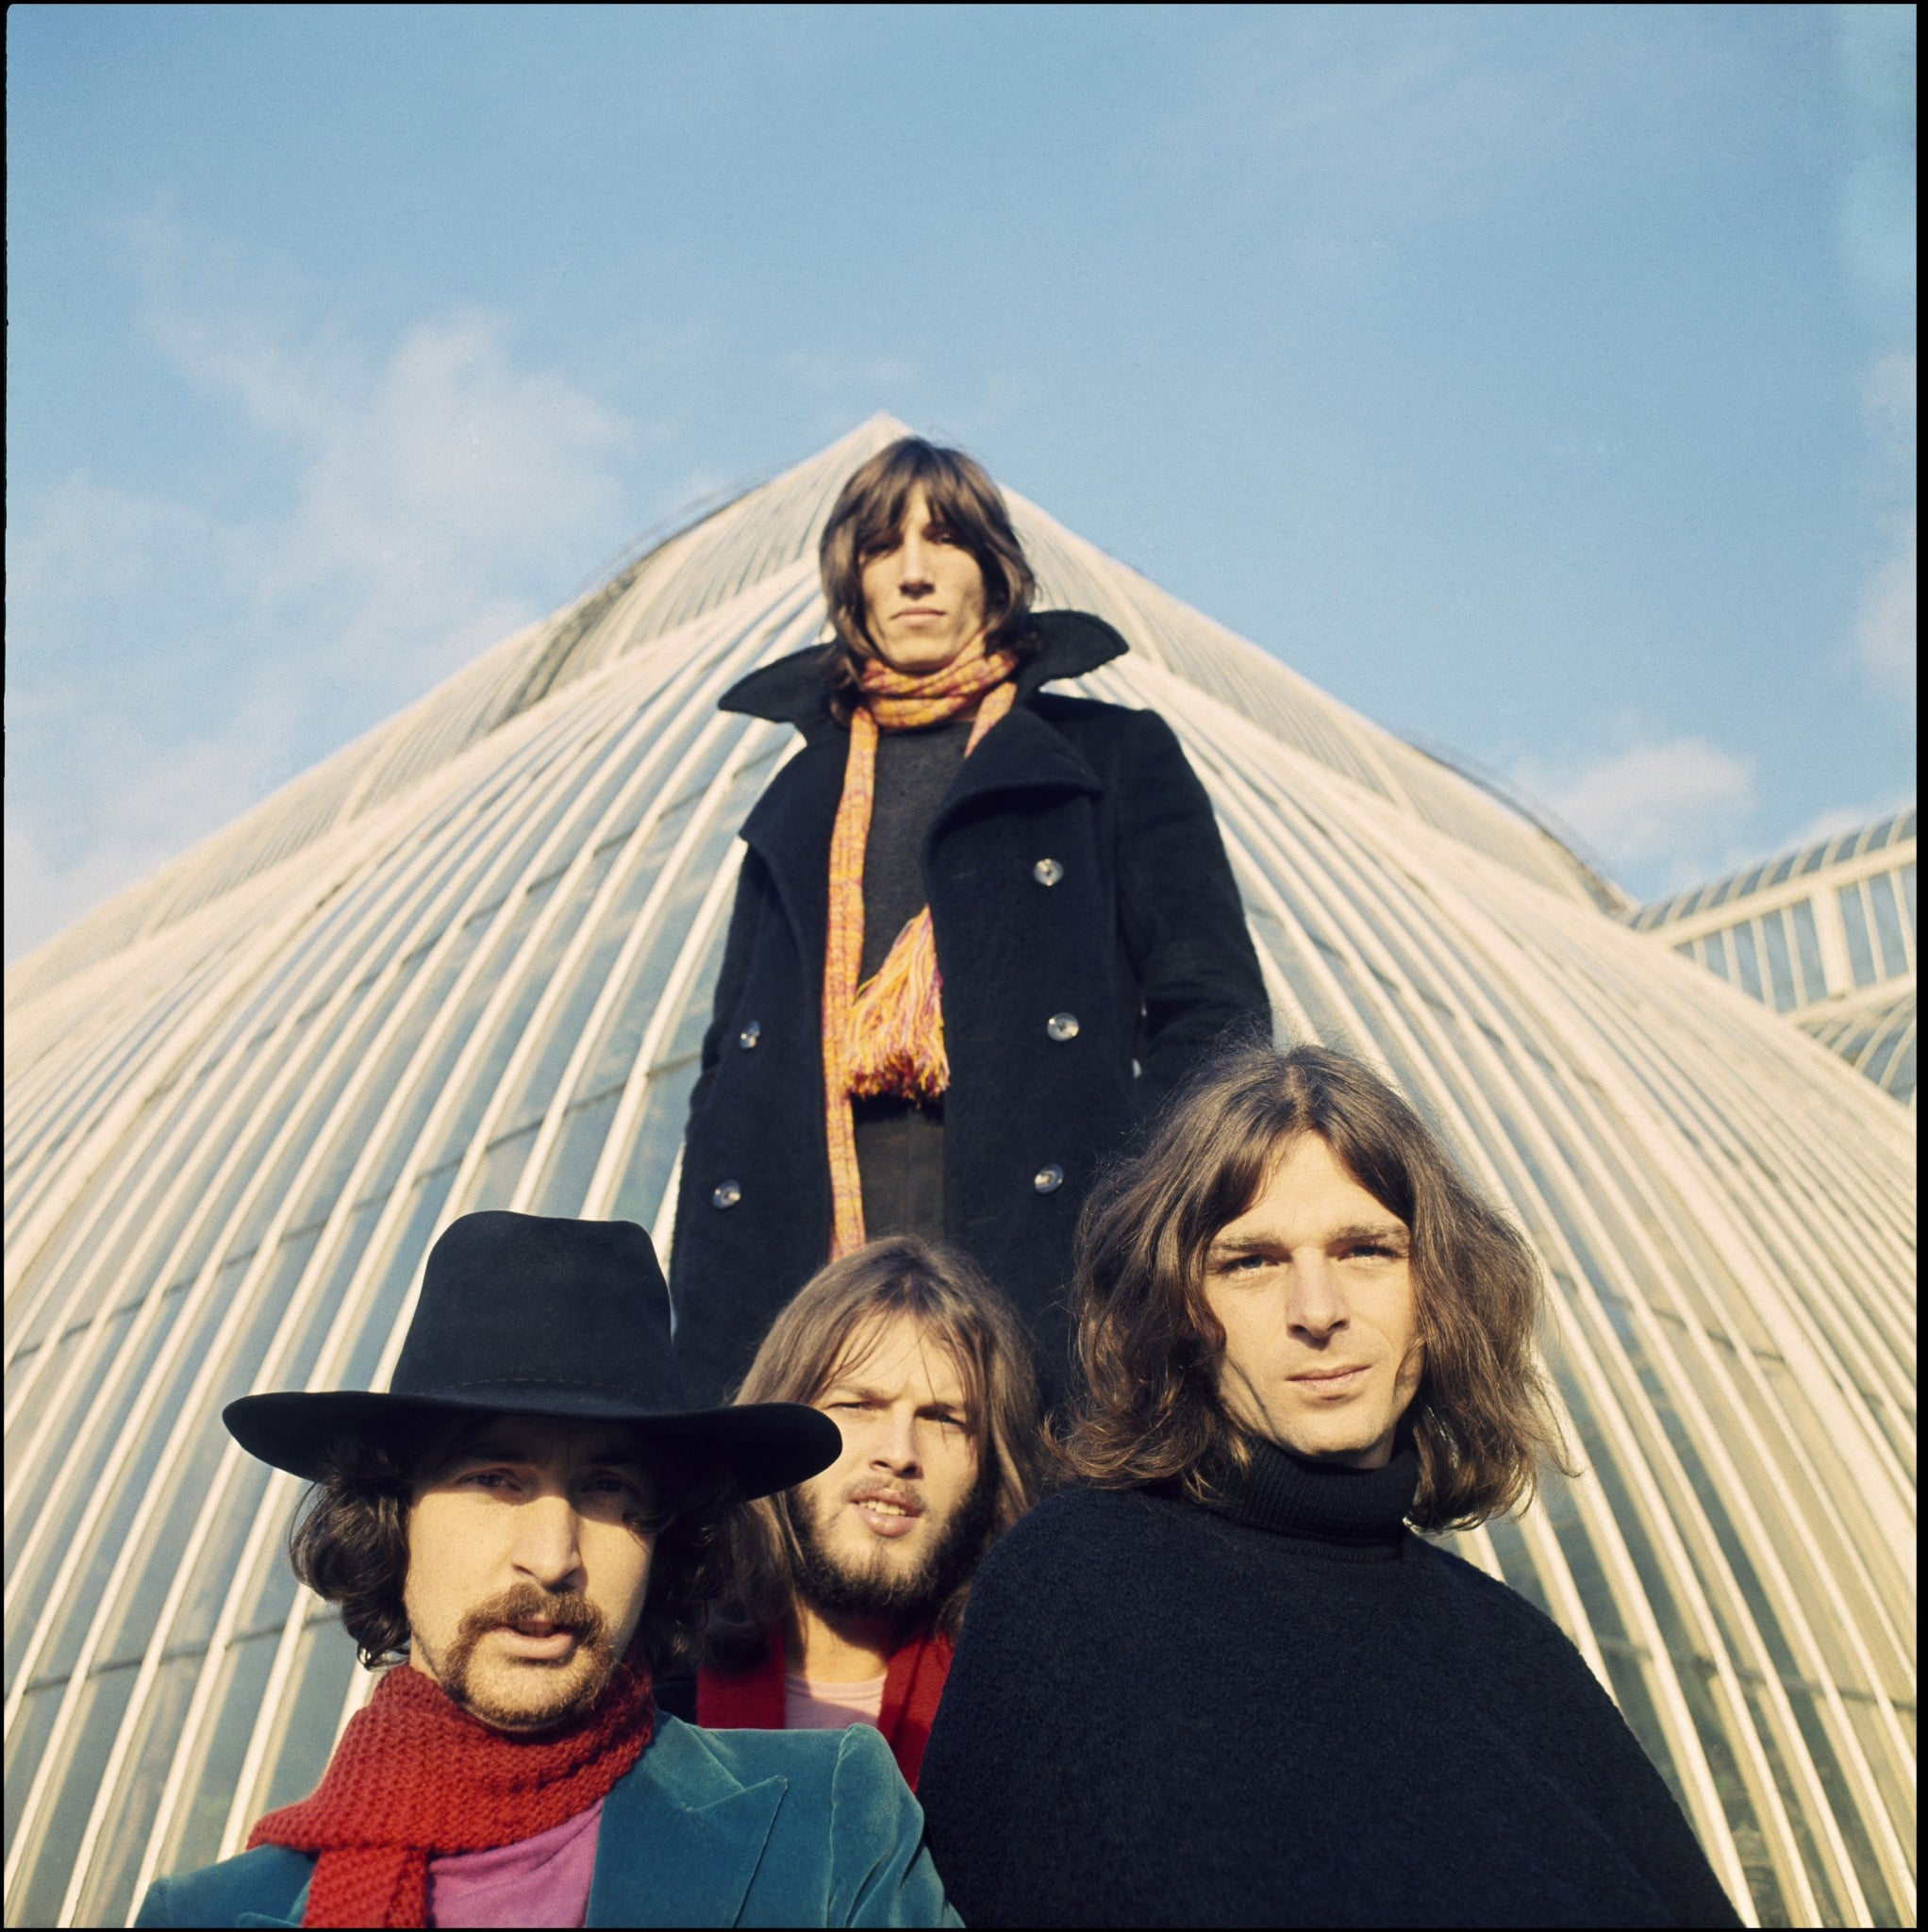 3_Pink_Floyd_NPA837A-8_-Photographer_Storm_Thorgerson_-_-Pink_Floyd_Music_Ltd